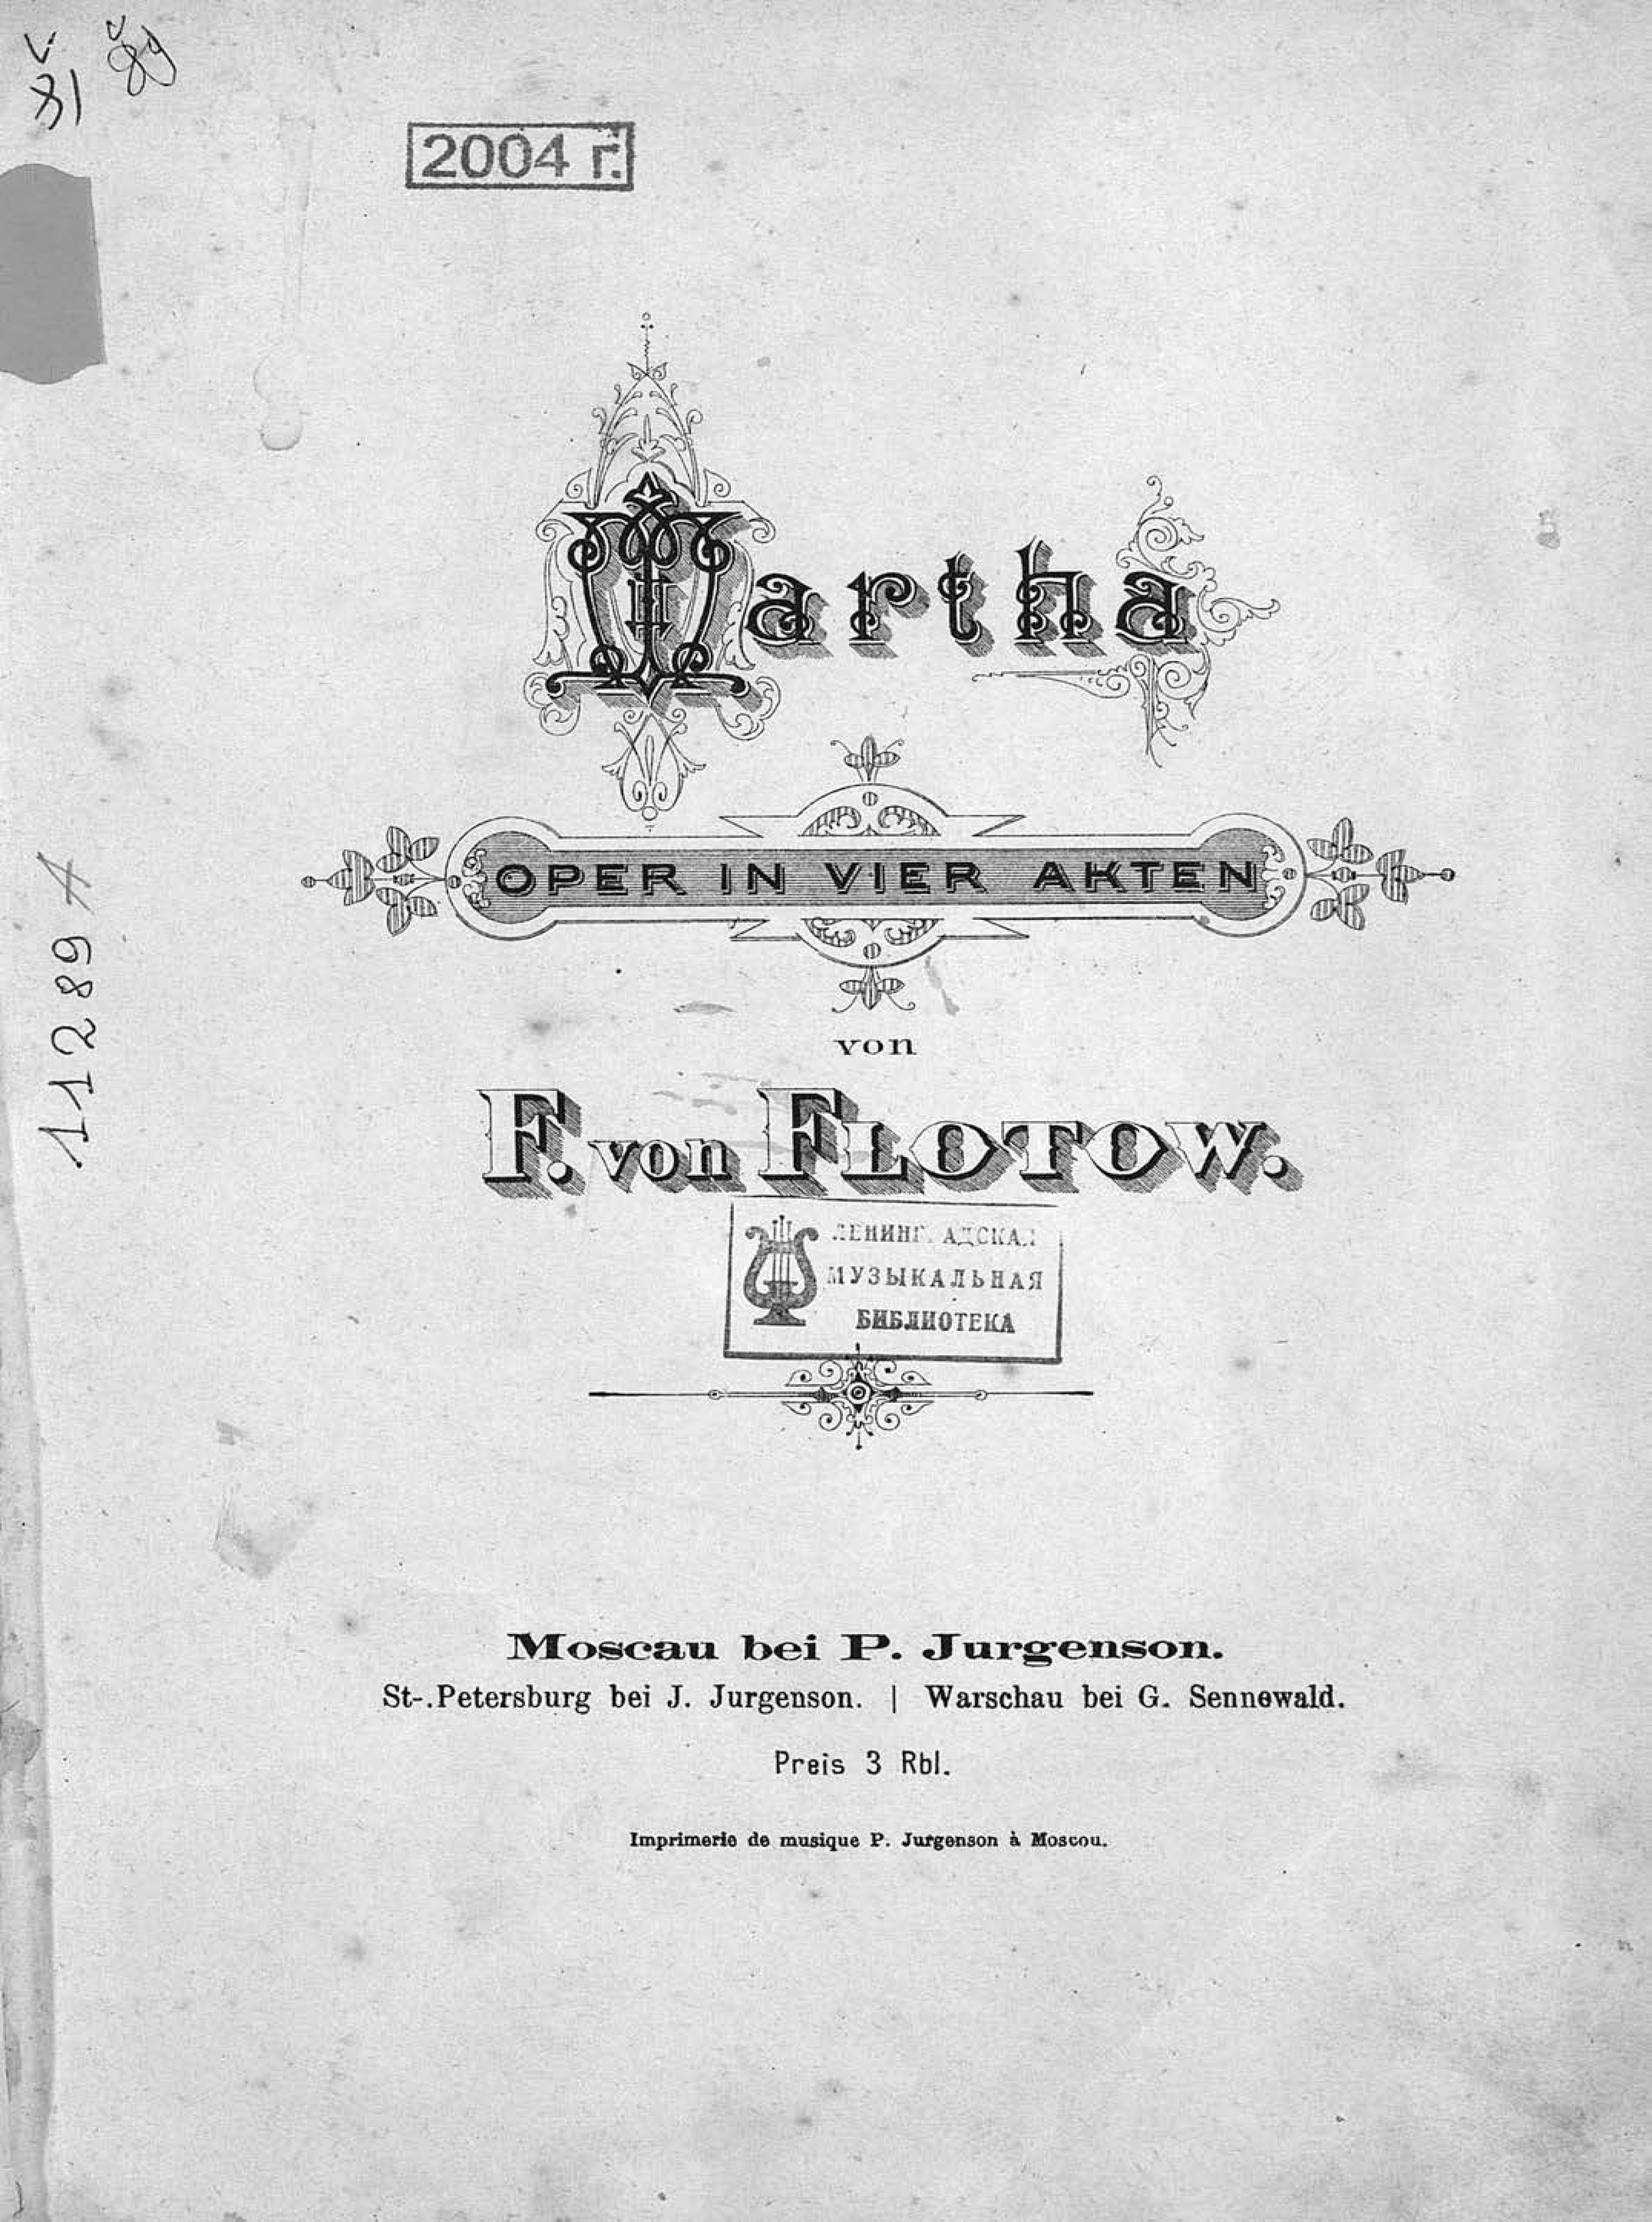 Фридрих фон Флотов Martha martha argerich